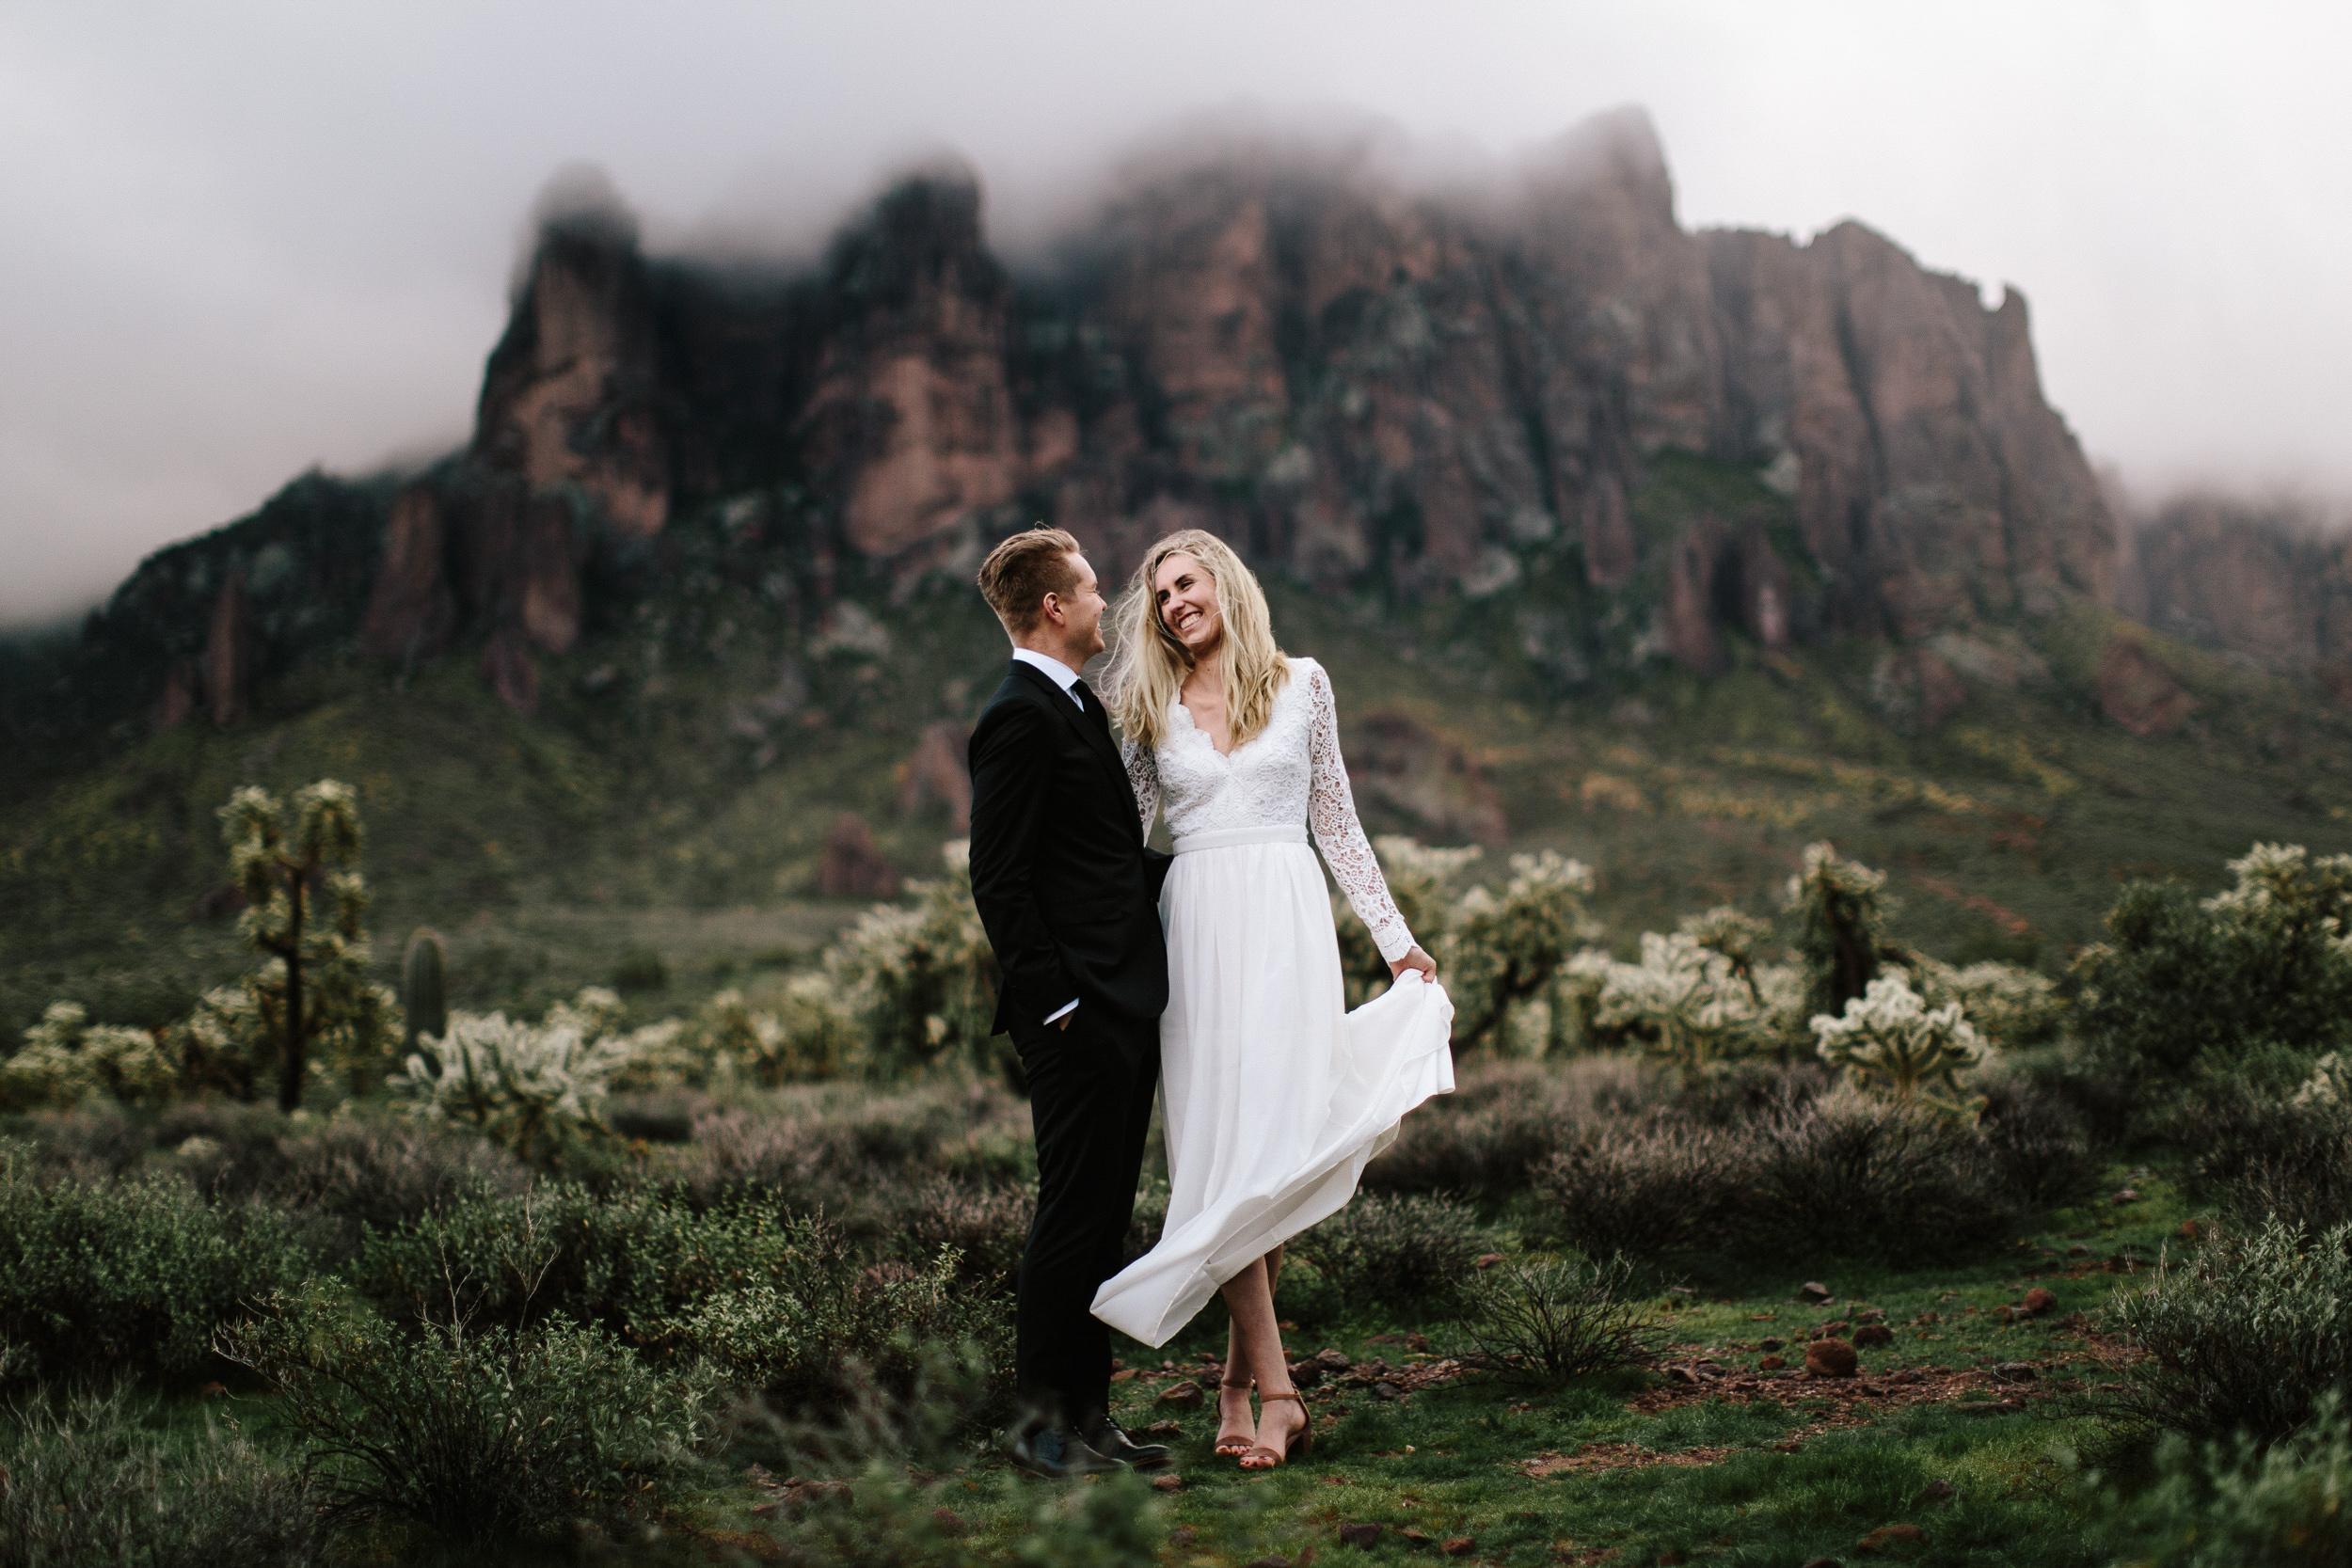 phoenix-mesa-elopement-wedding-photographer-lost-dutchman-state-park-superstitious-mountains-28.jpg